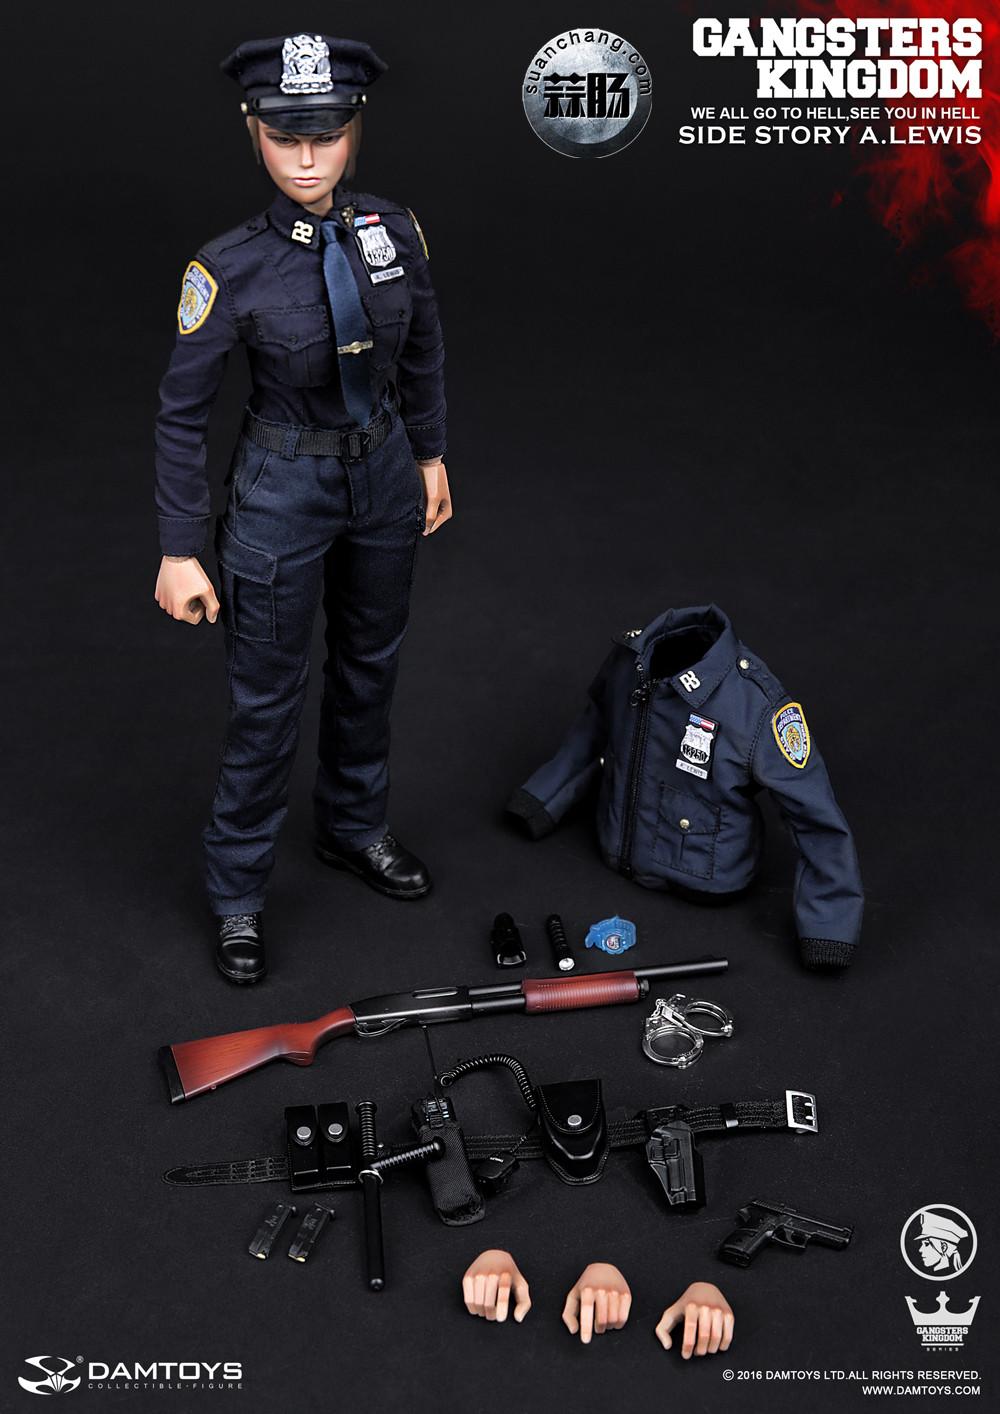 DAMTOYS 1/6黑帮王国系列 番外篇:安妮·刘易斯 警官 模玩 第14张